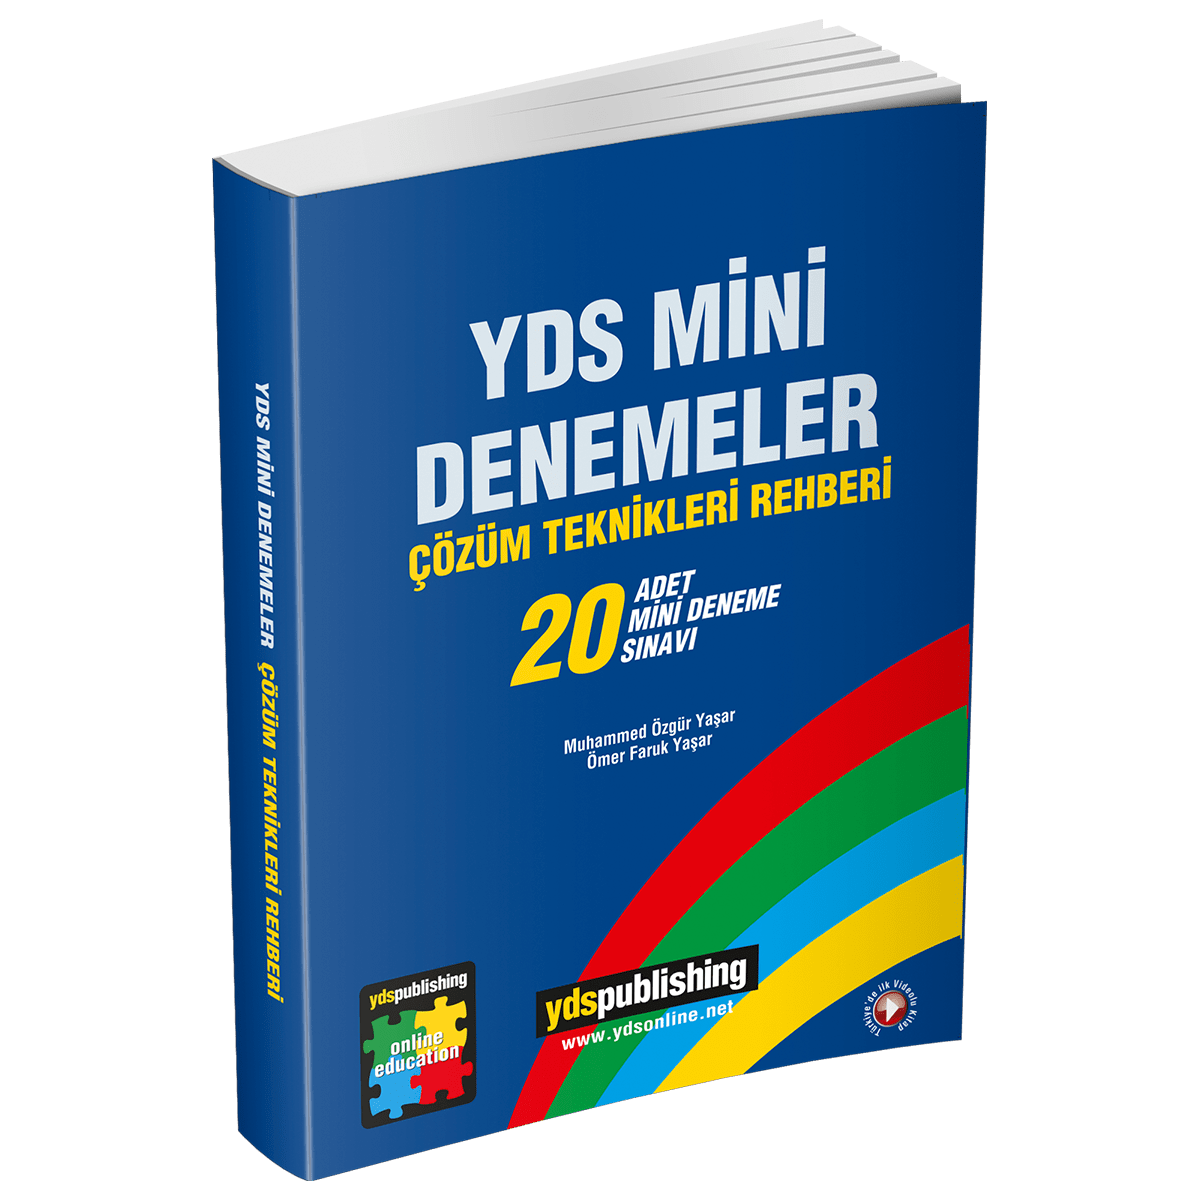 YDS Mini Denemeler (20'li) yds mini denemeler - YDS Mini Denemeler (20'li) – 40'ar soruluk 20 Deneme Sınavı